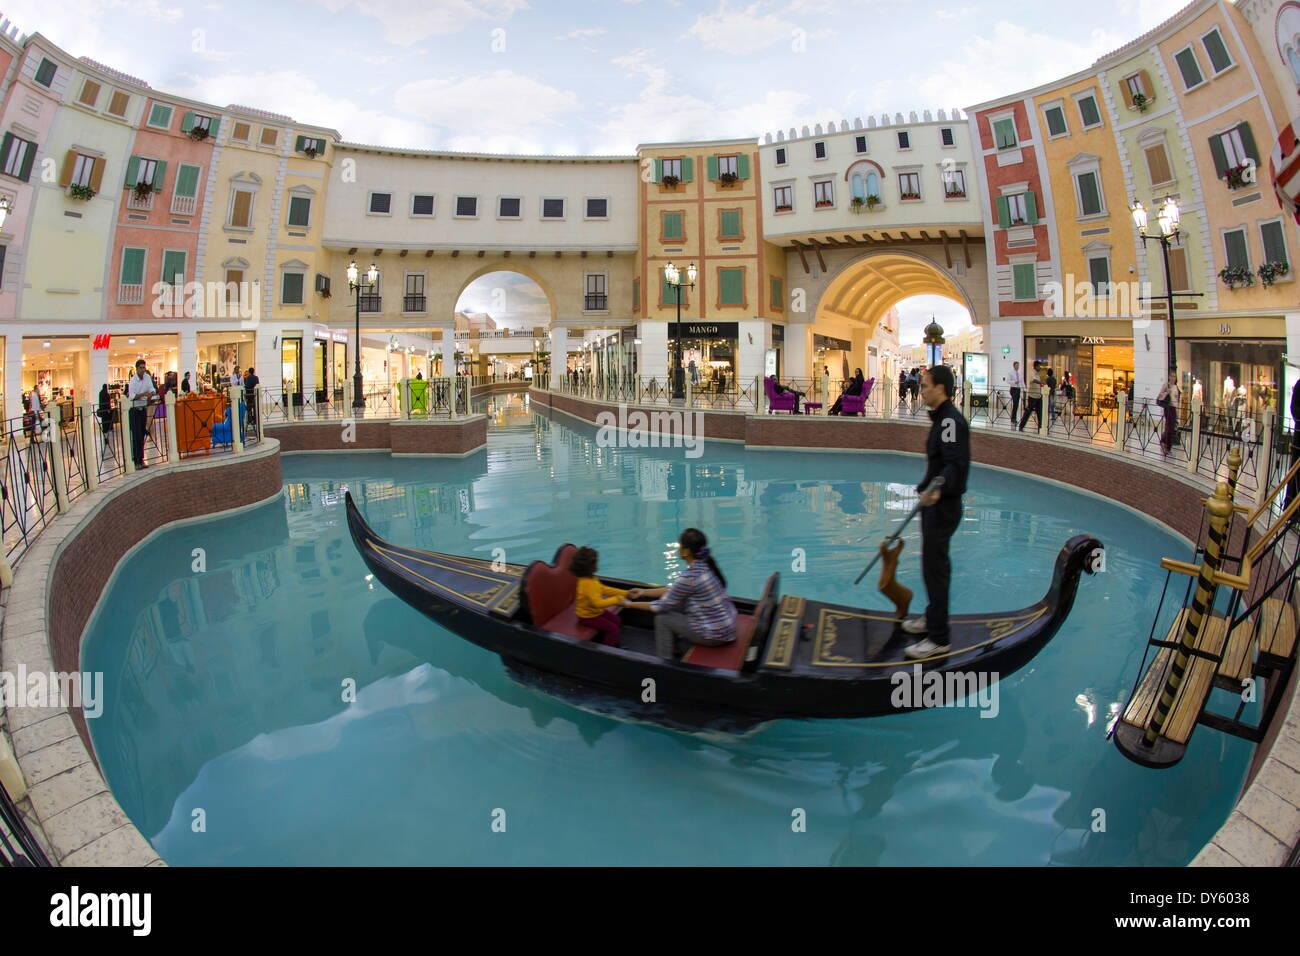 Interior, Villaggio Mall, Doha, Qatar, Oriente Medio Imagen De Stock